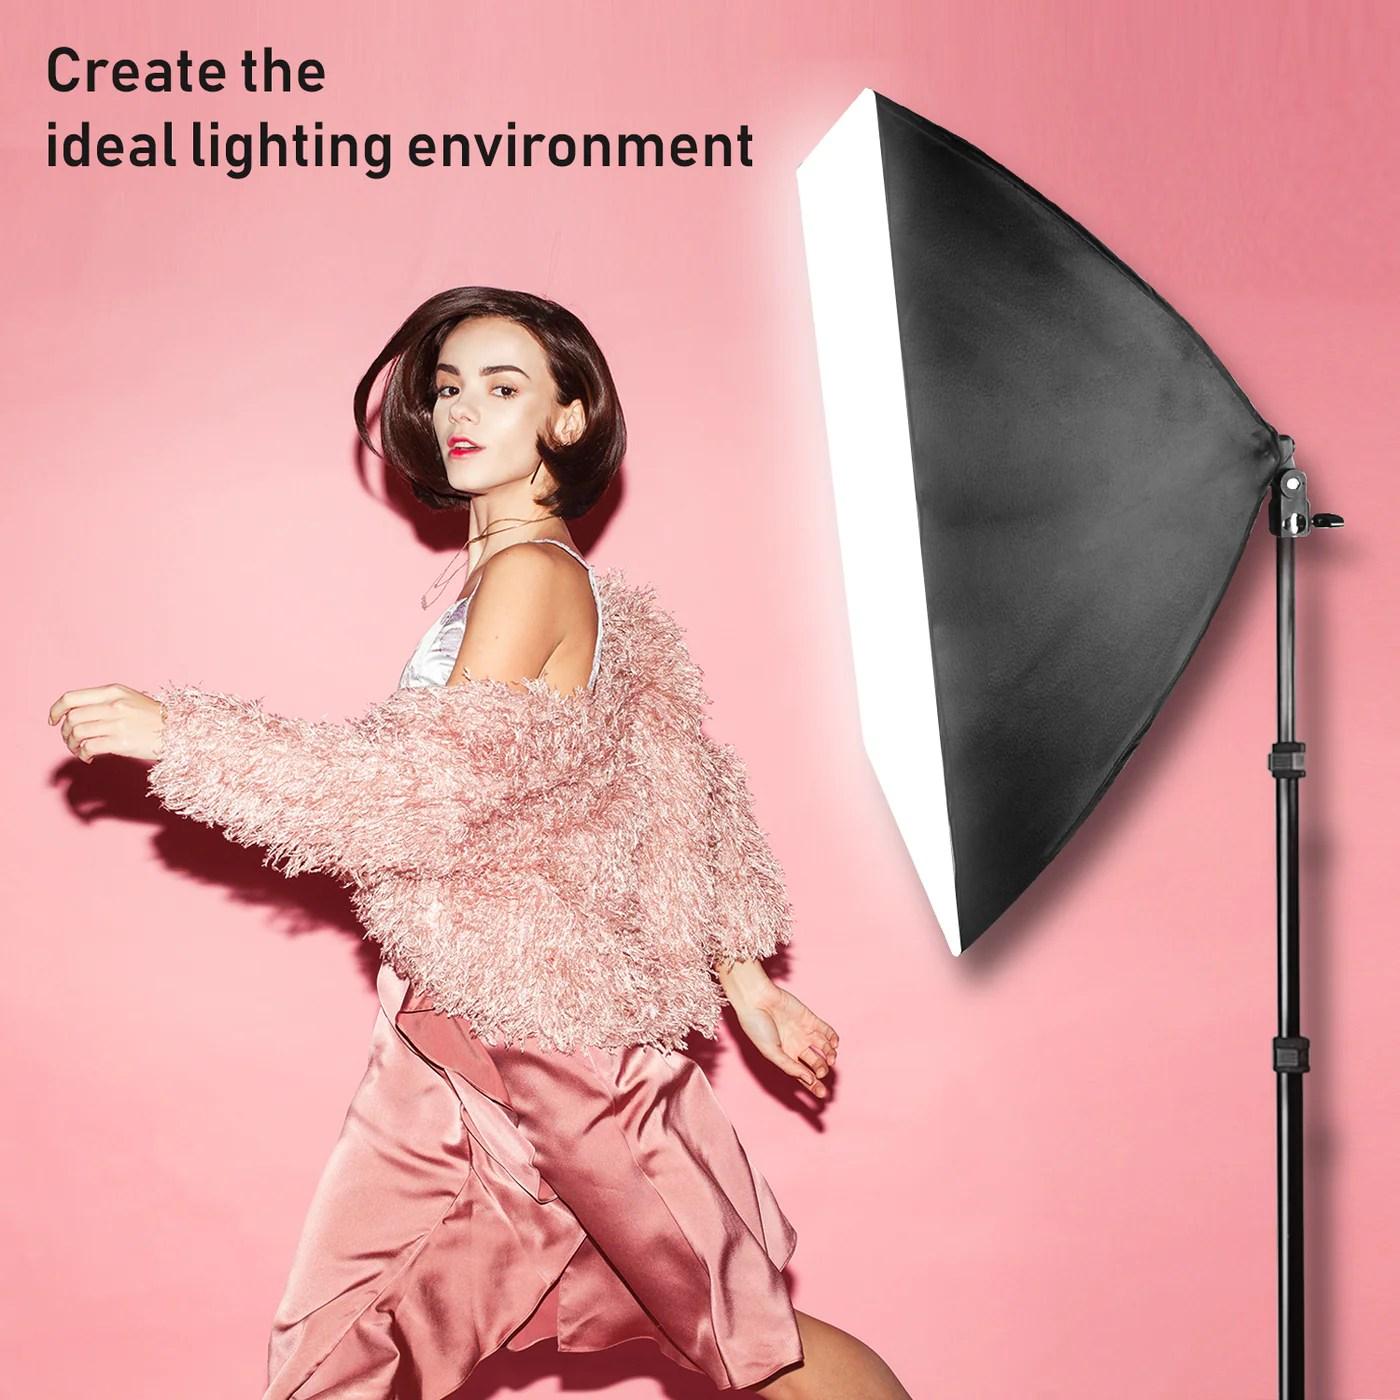 limostudio 700w photo video studio soft box lighting kit 20 x 28 inch dimension softbox light reflector with photo bulb photography studio